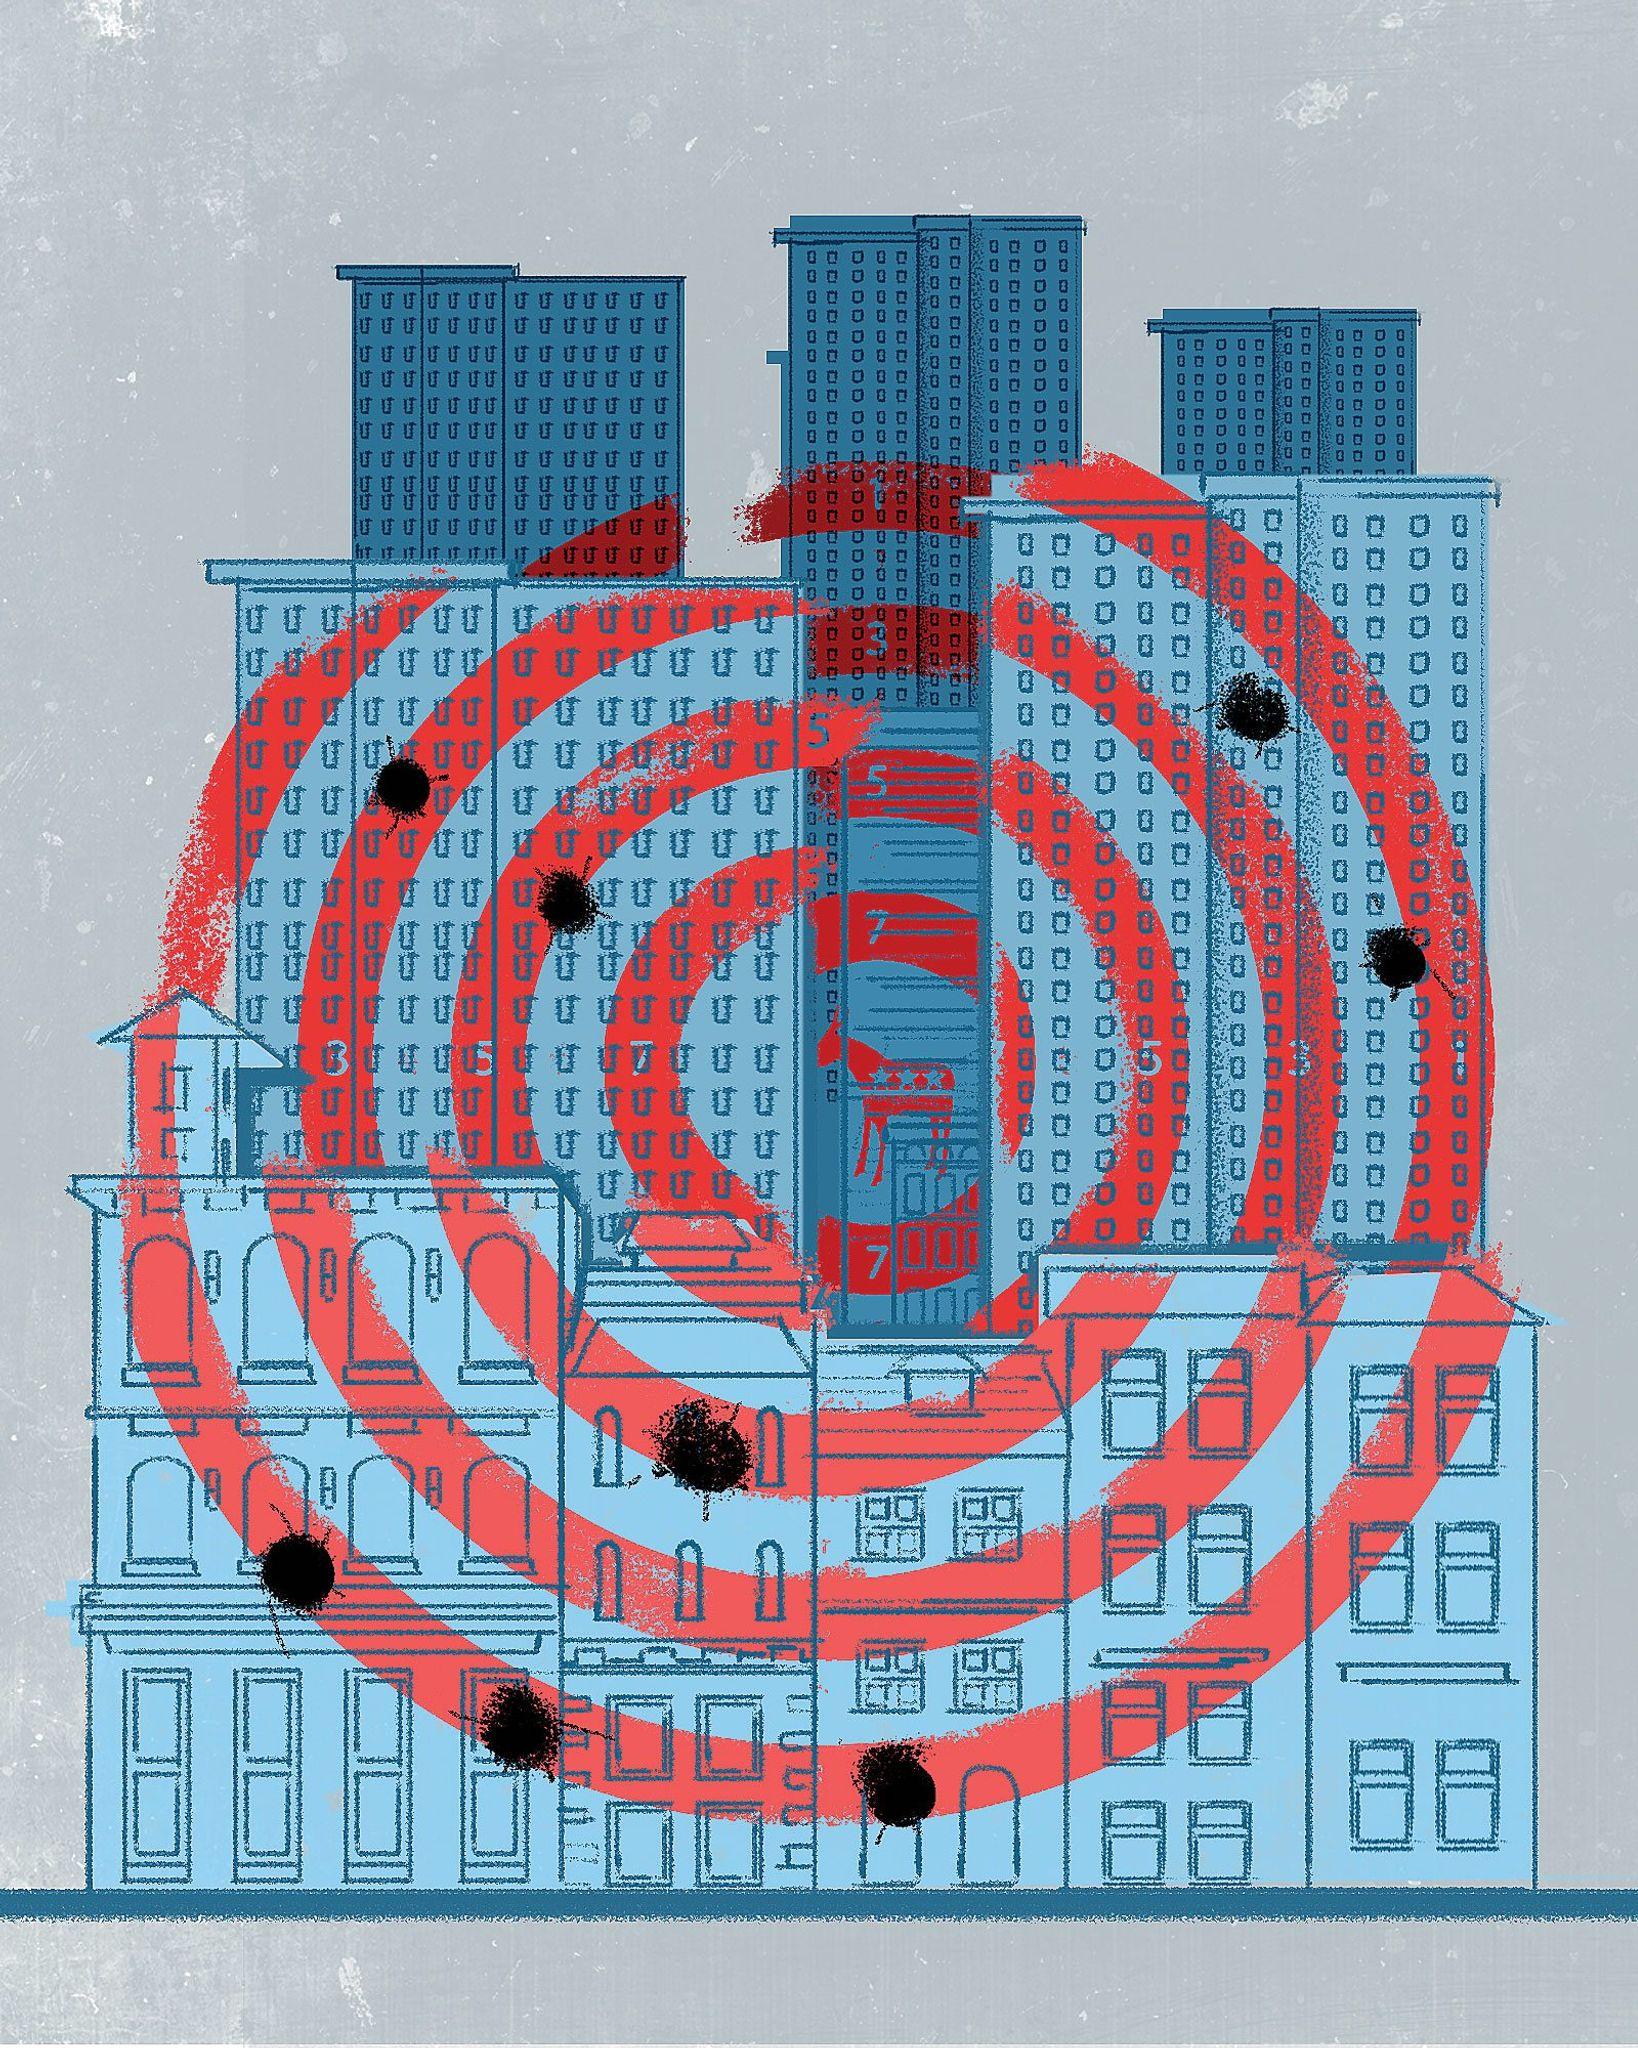 Democrats ruining America's cities